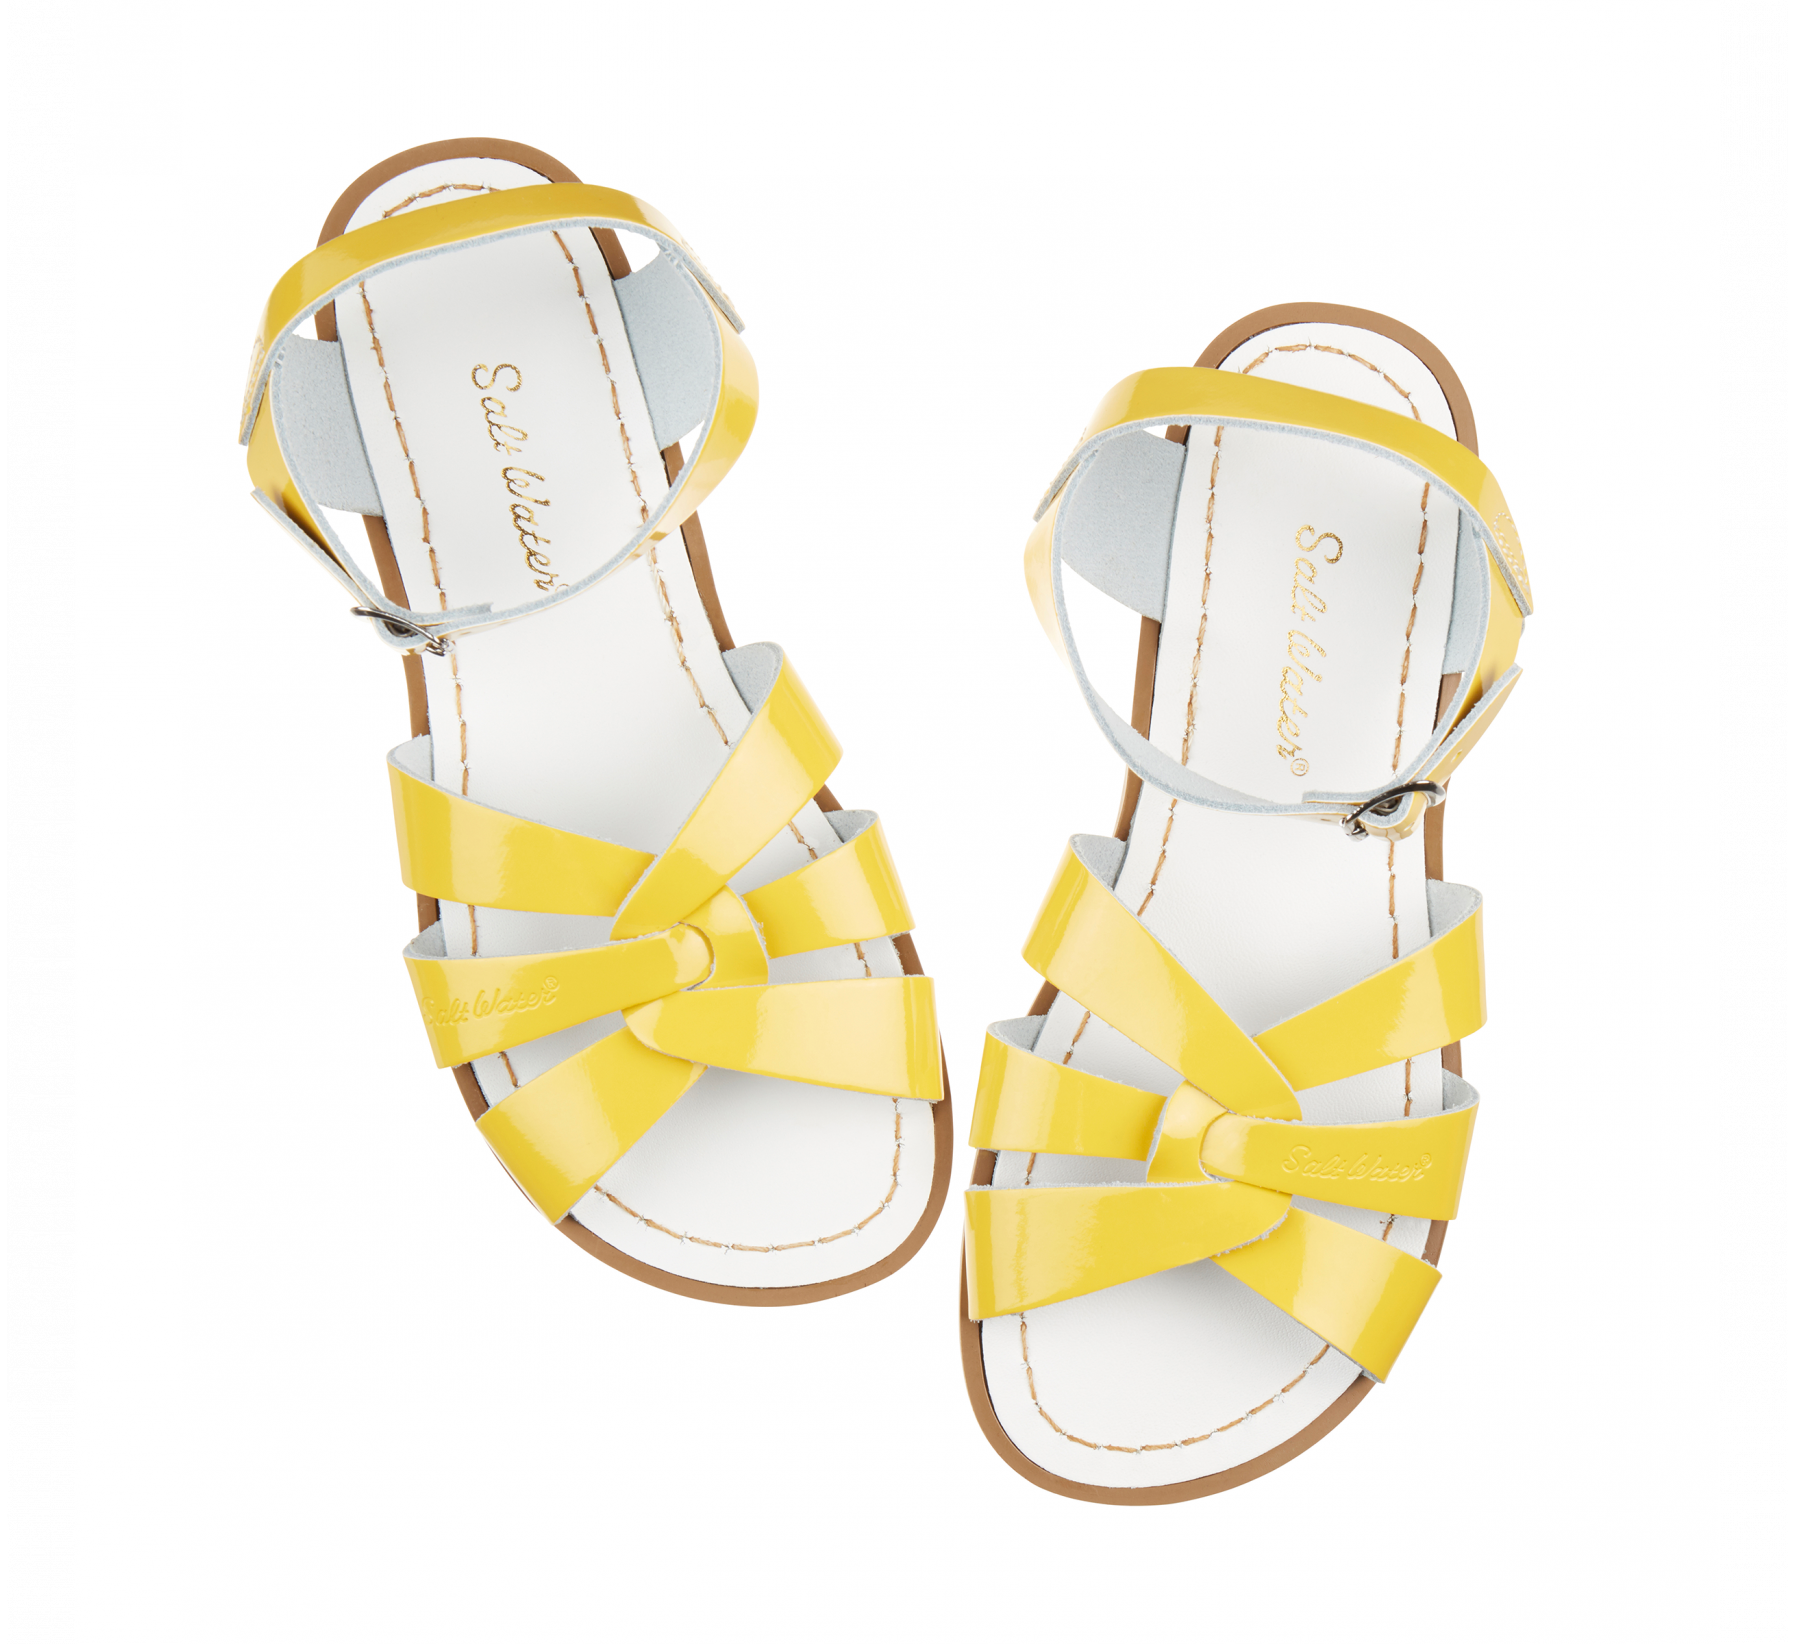 Original Shiny Yellow - Salt Water Sandals